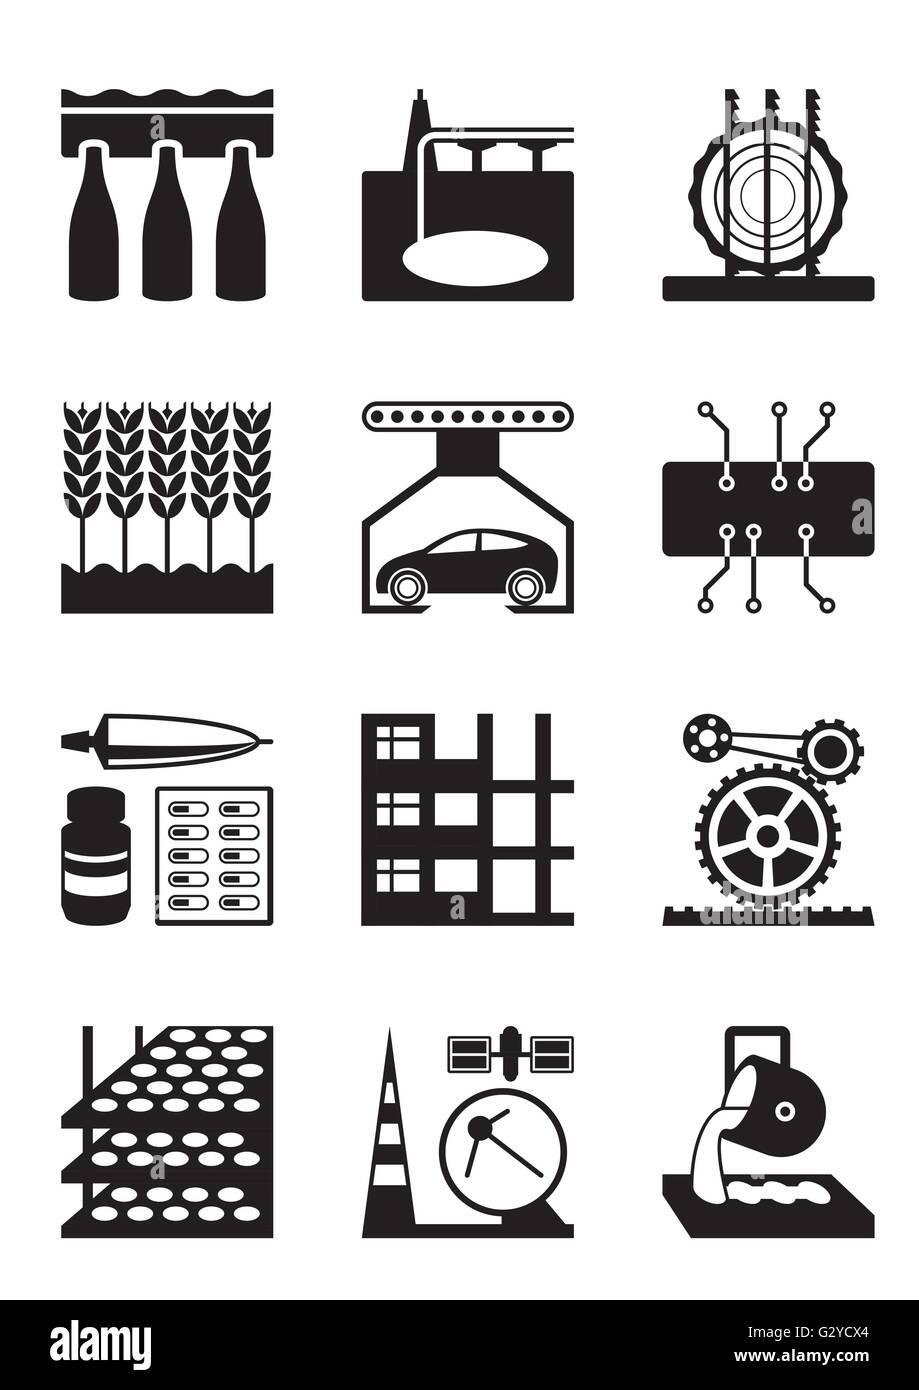 Light and heavy industry - vector illustration - Stock Vector